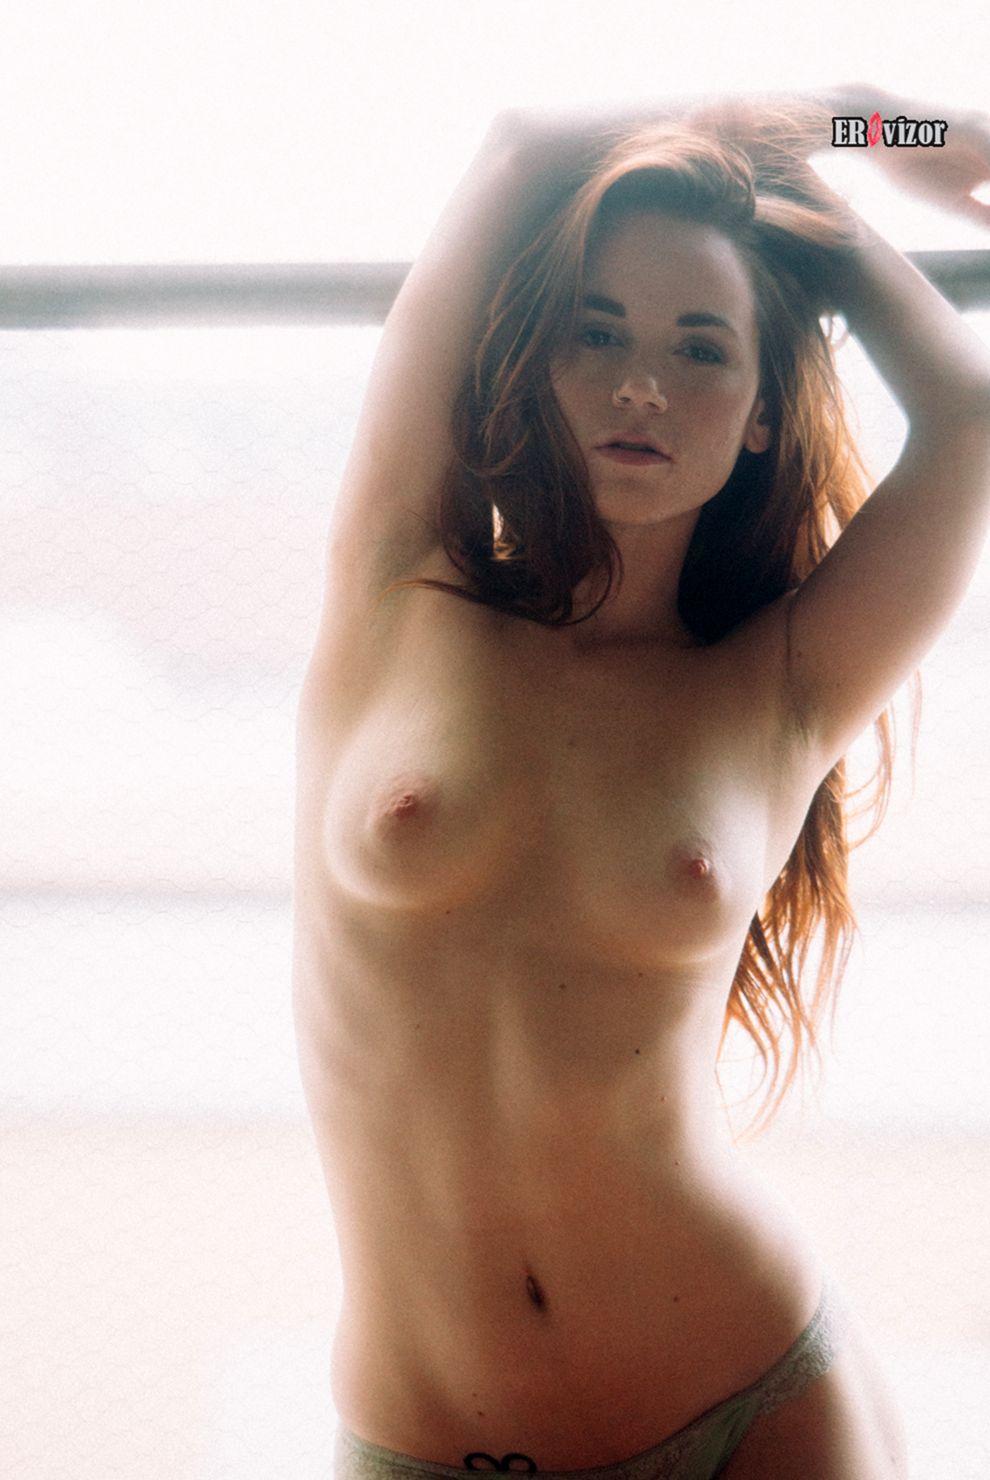 legkaya_erotica-erovizor (21)